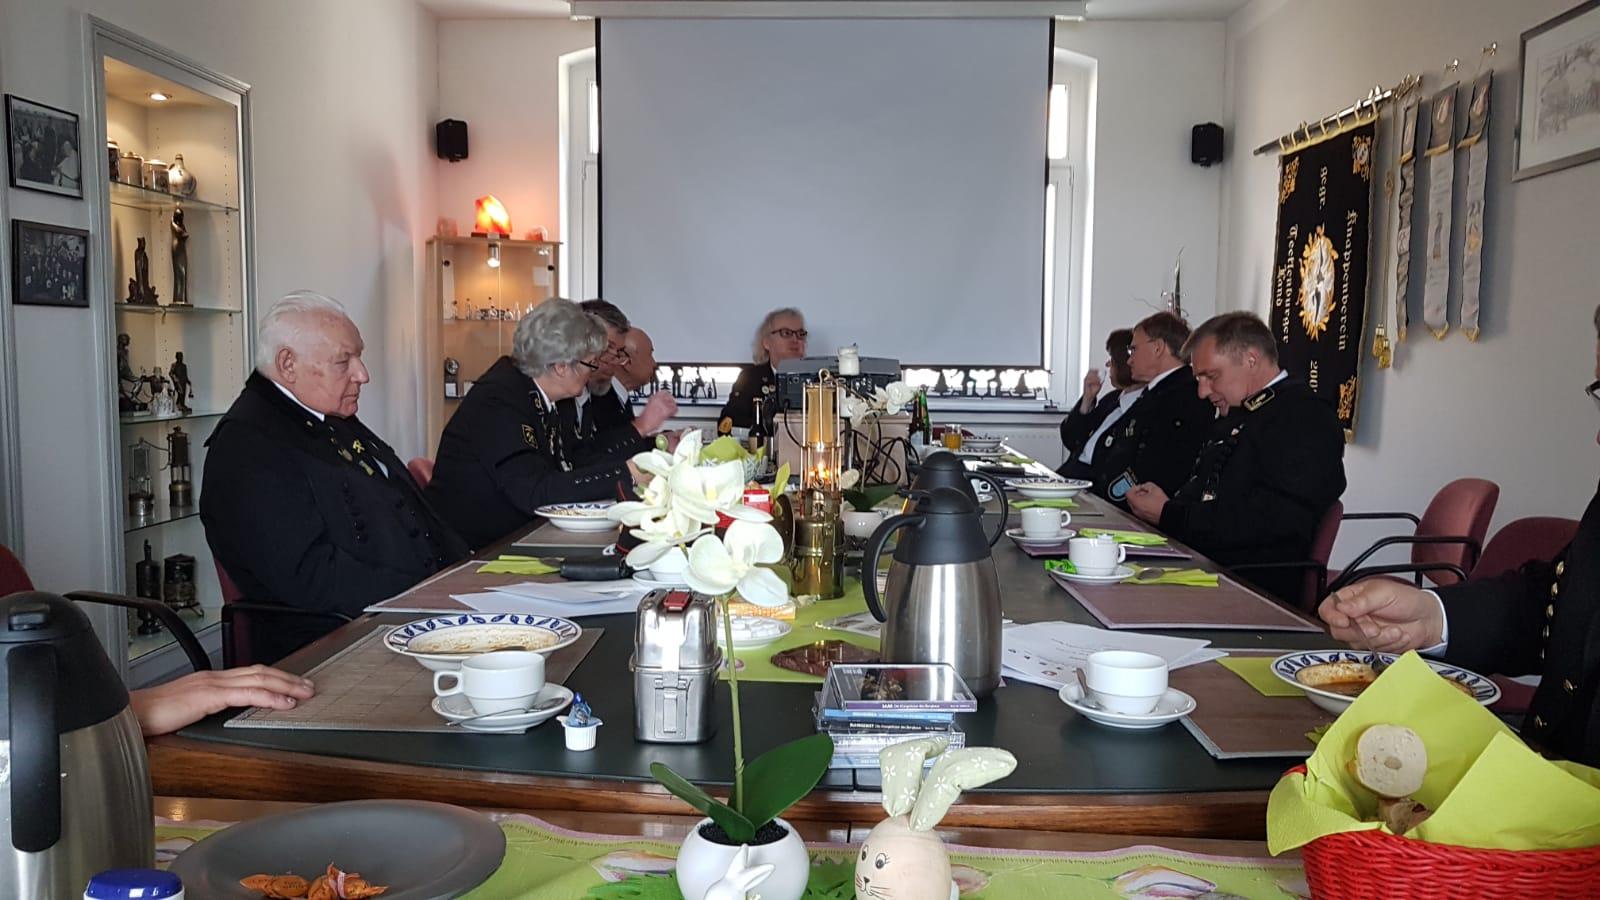 Bergmannsglück-Datteln in Ibbenbüren